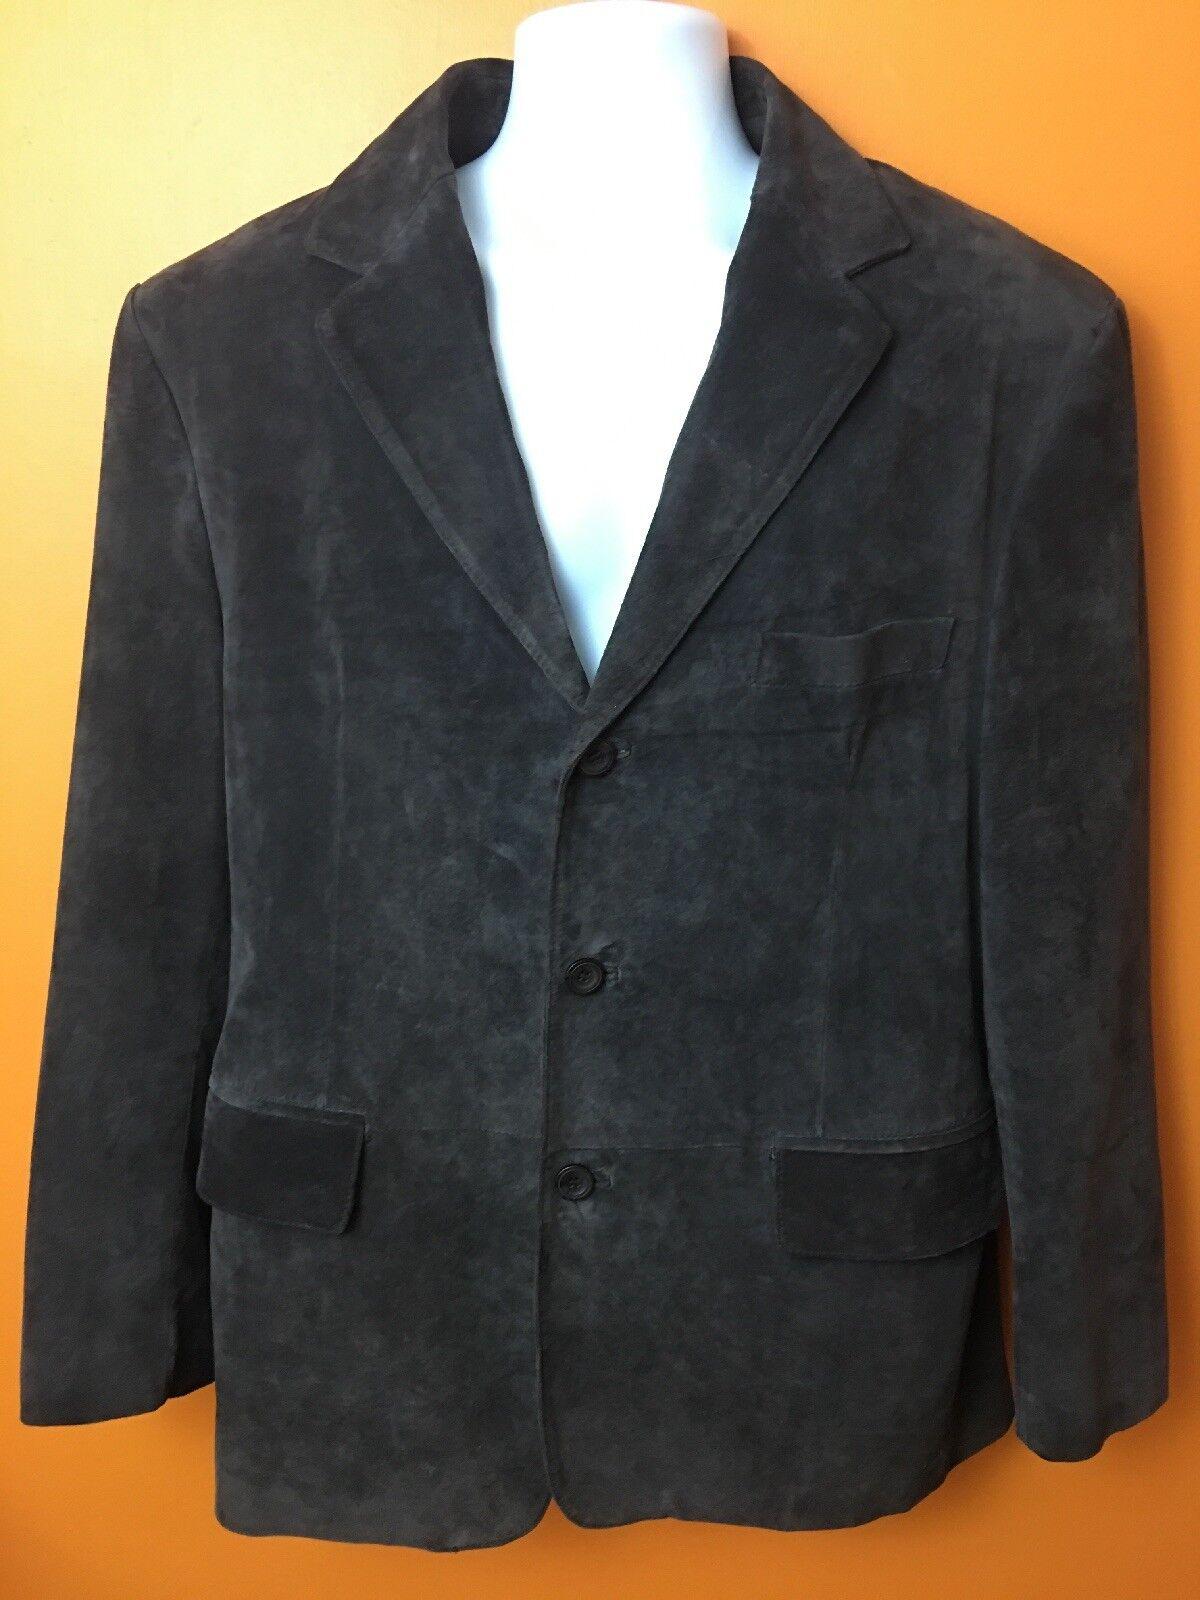 Apt 9 Men's Suede Leder Sport Coat Blazer 44 Regular Dark Braun